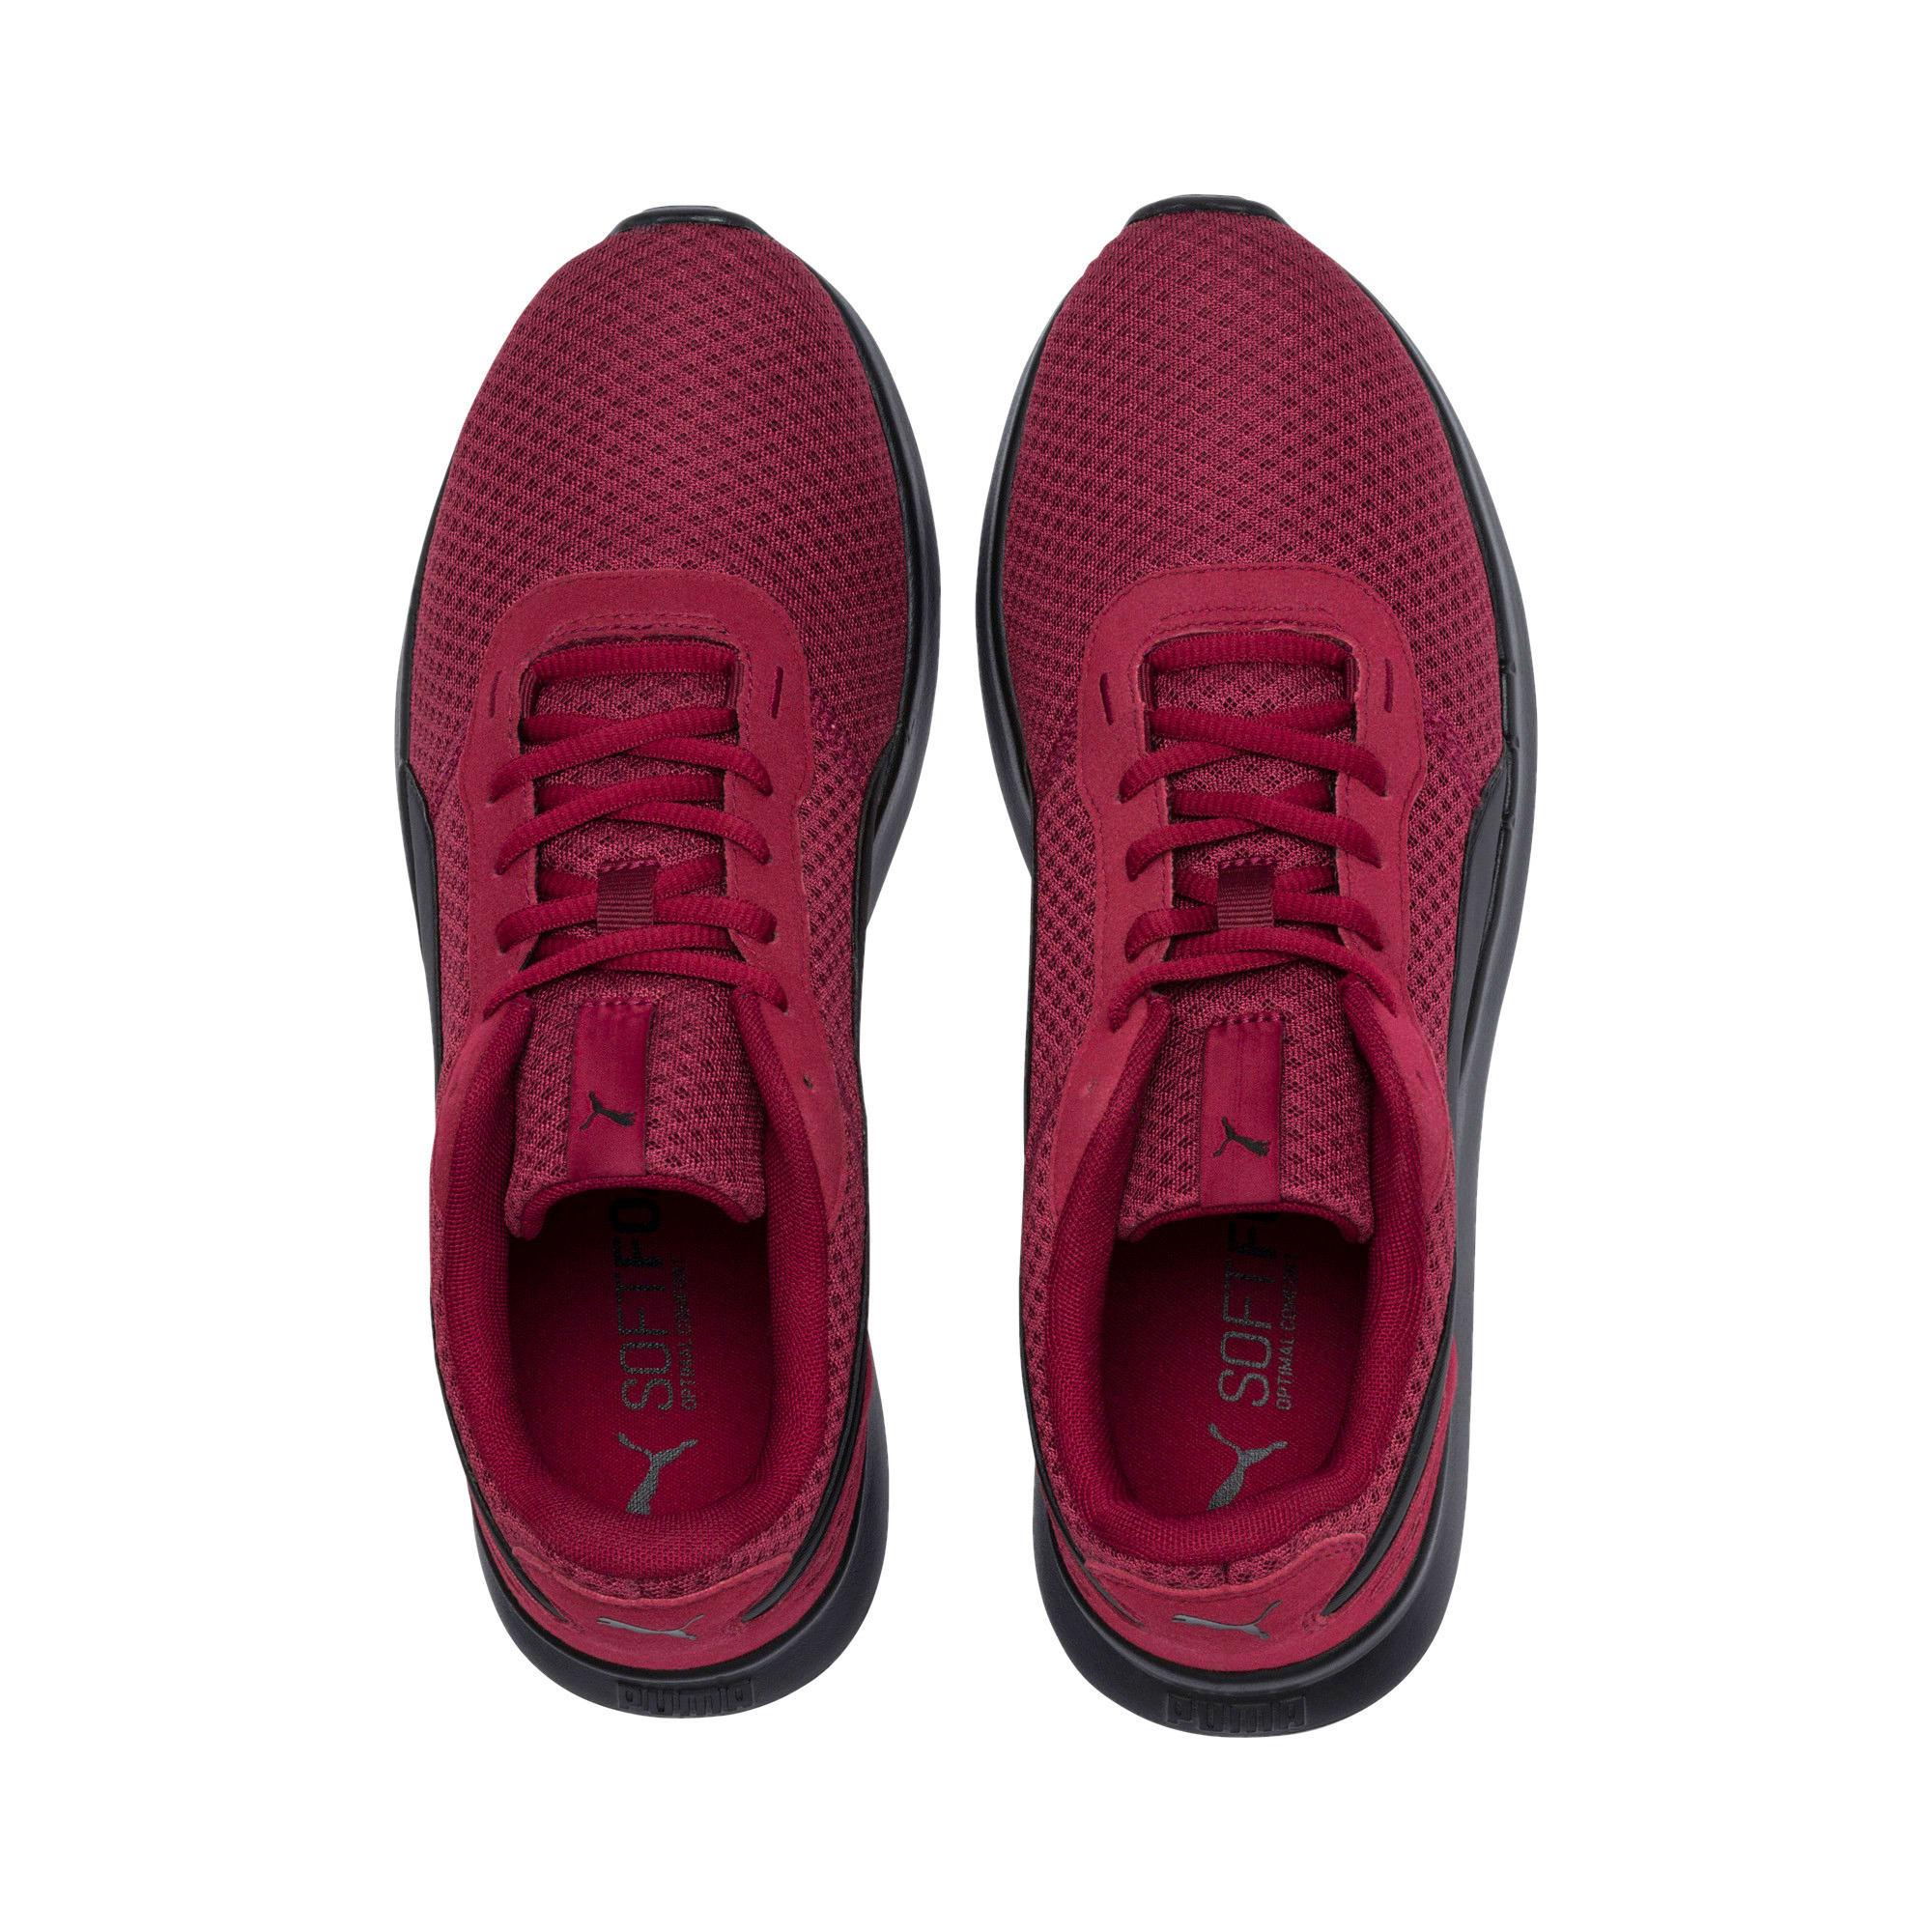 Thumbnail 7 of ST Activate Sneakers, Rhubarb-Puma Black, medium